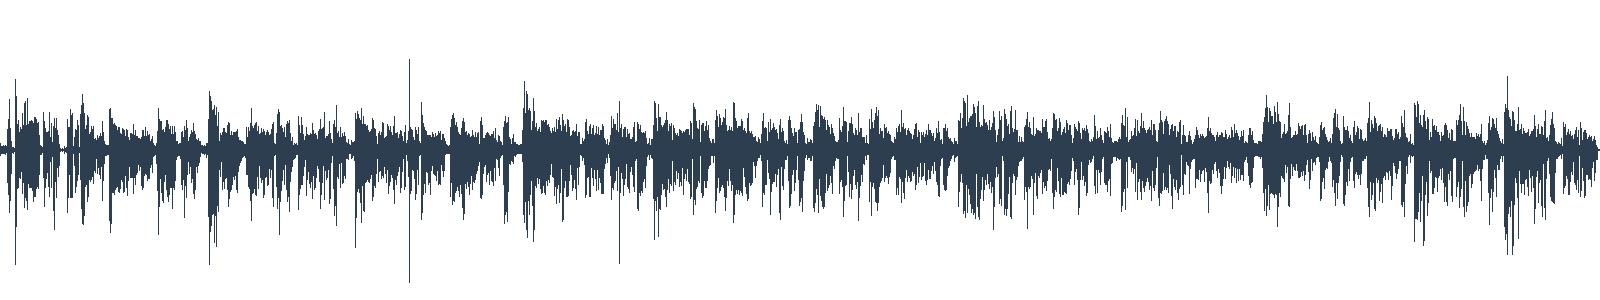 Nové audioknihy 24/2019 waveform